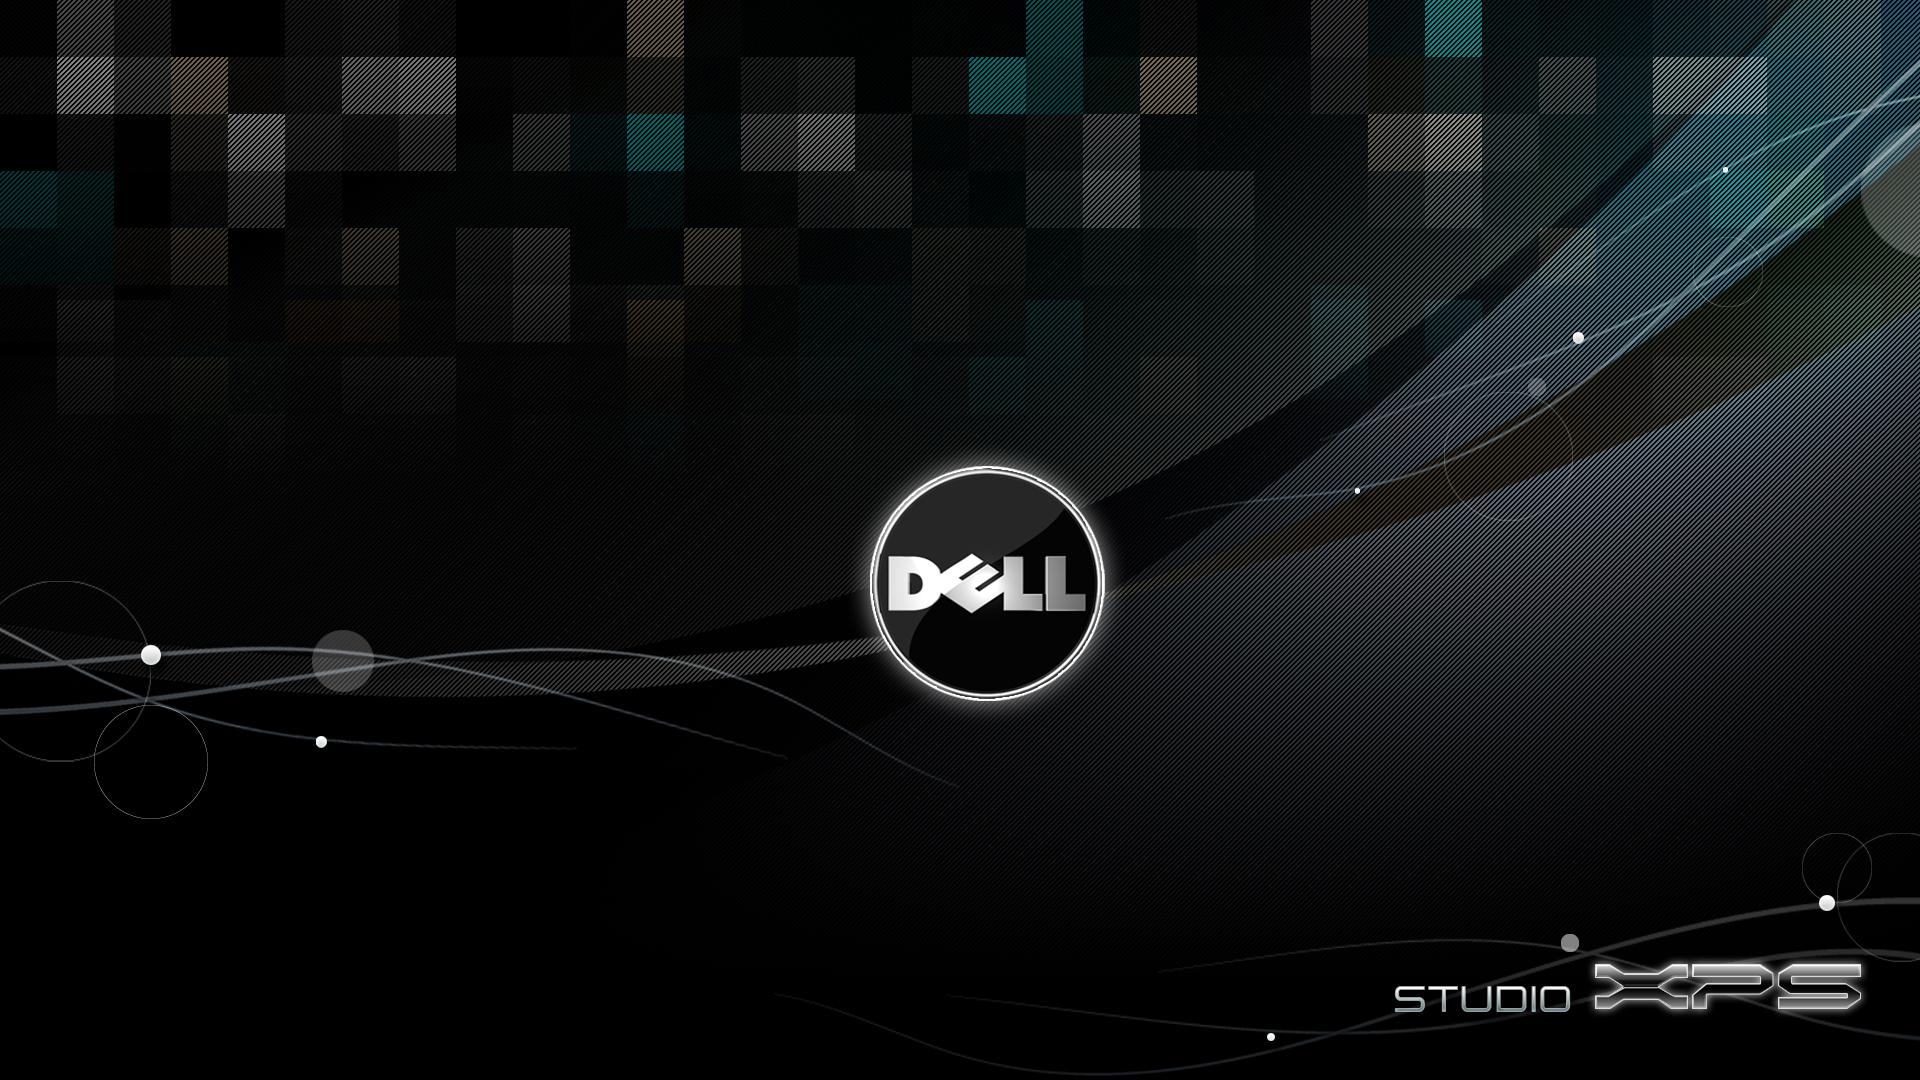 Dell Studio Wallpapers Dell Wallpaper Black 1920x1080